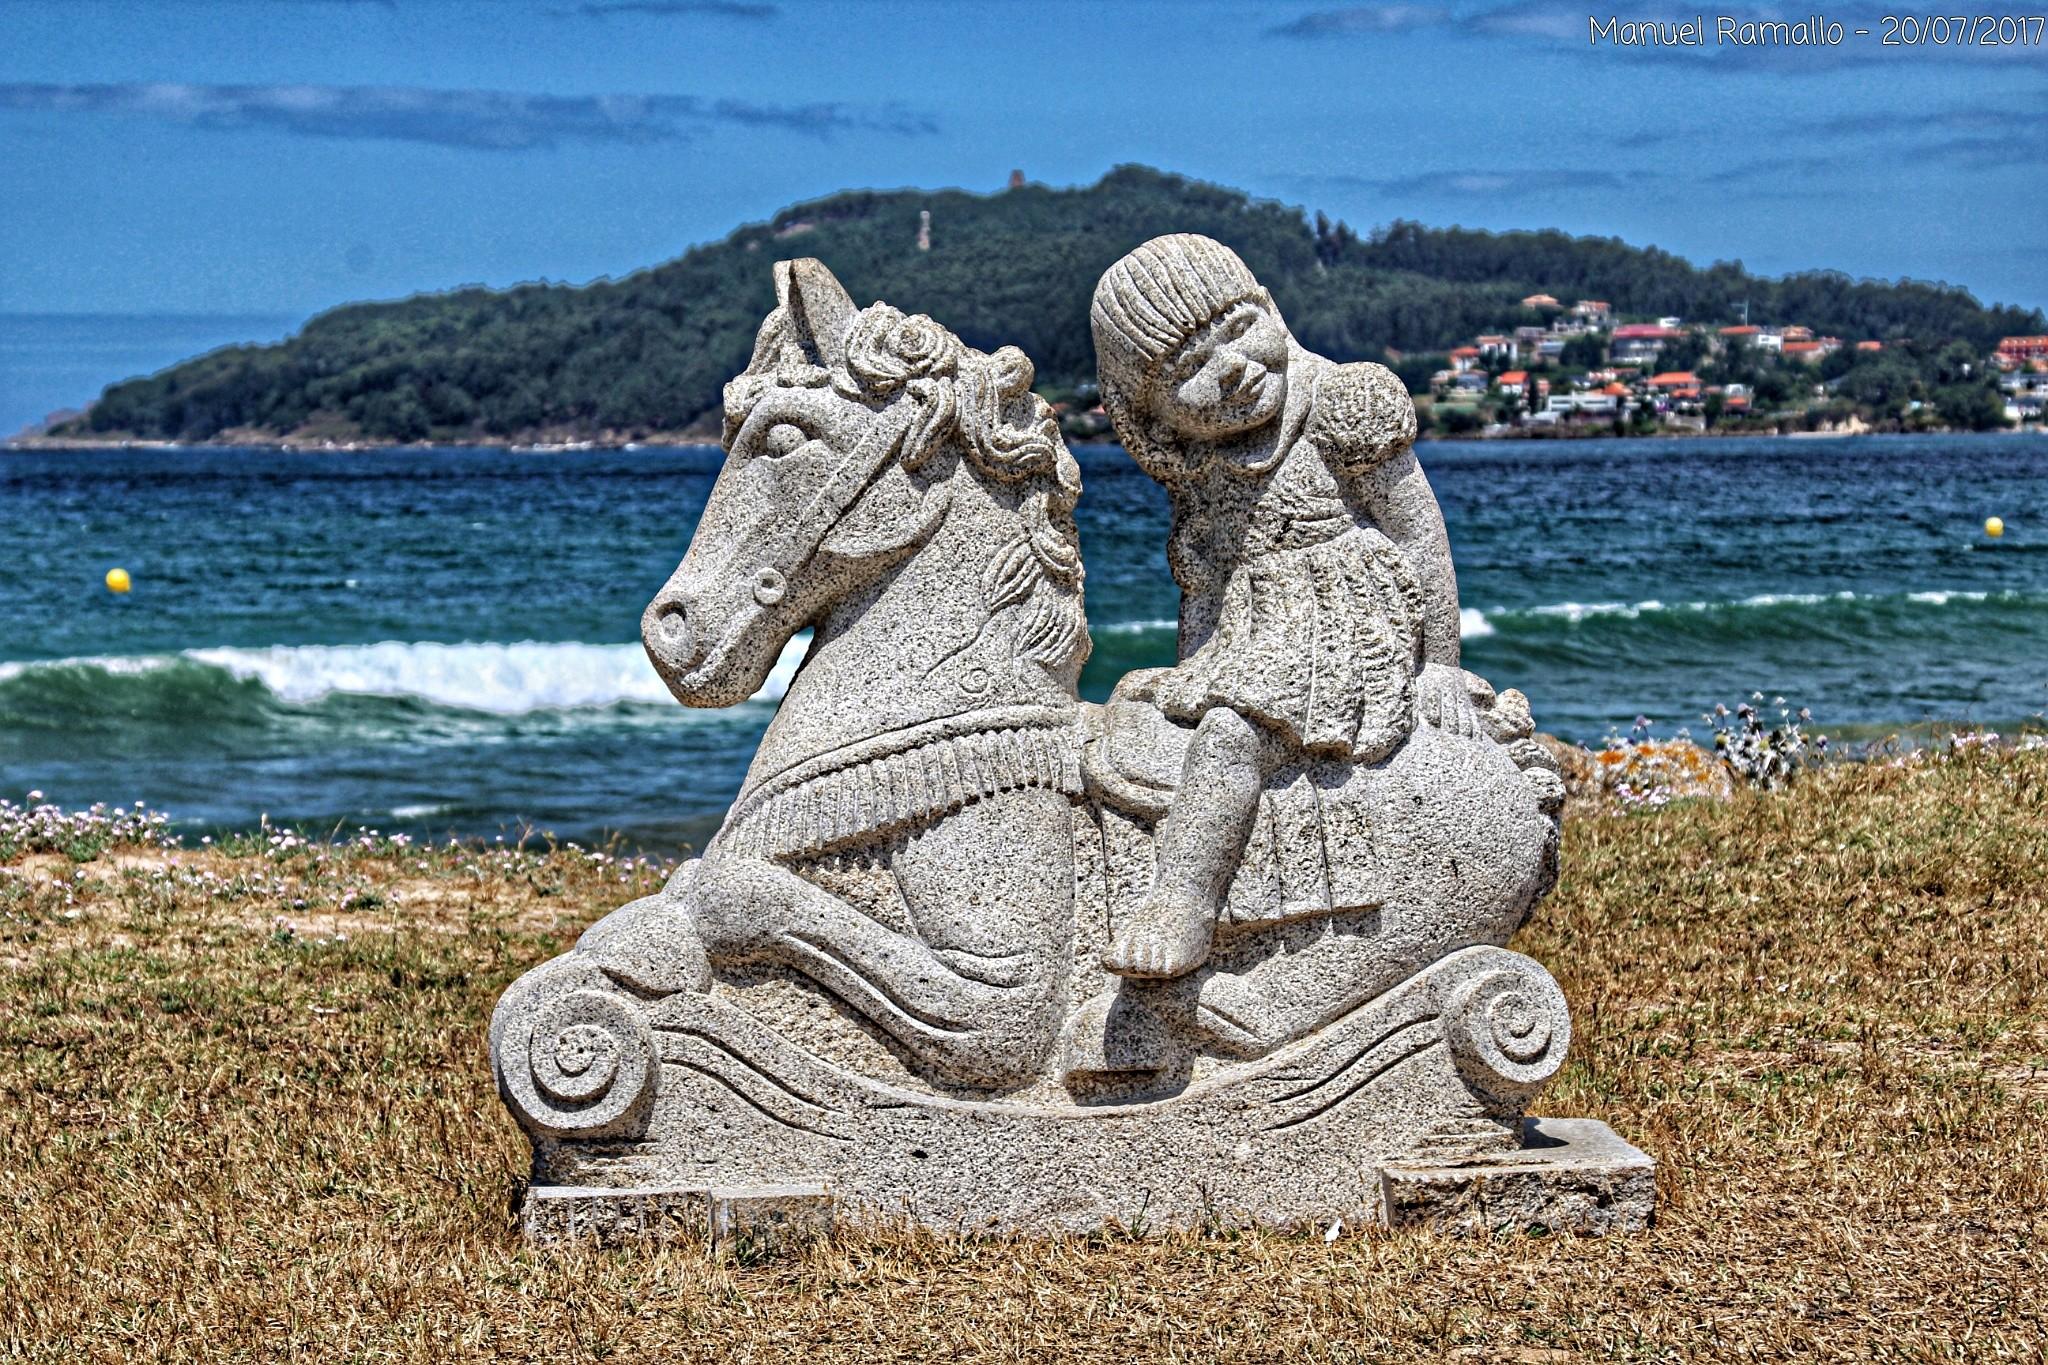 escultura-piedra-granito-nina-caballo-tiovivo-playa-america-pontevedra